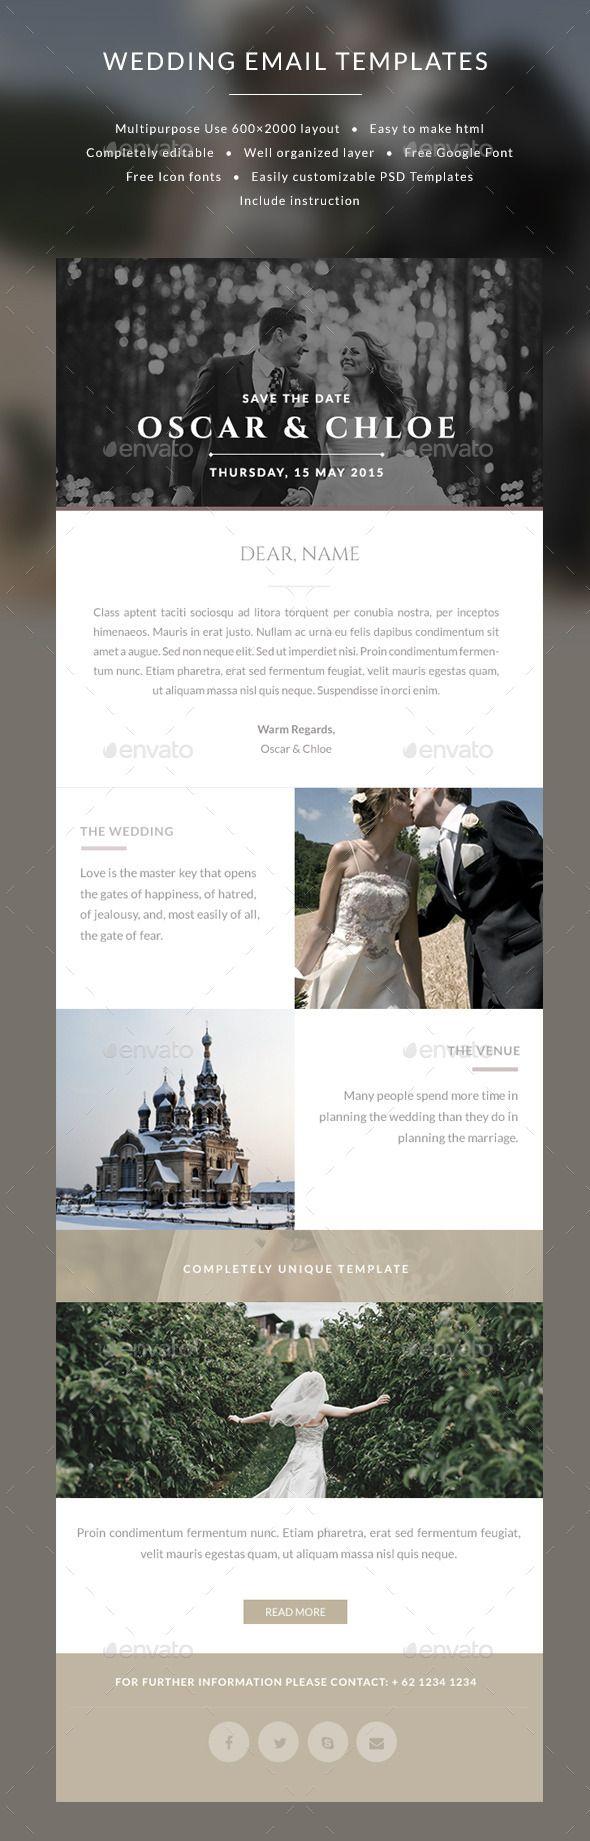 best ideas about wedding invitation templates email wedding invitation templates oscar